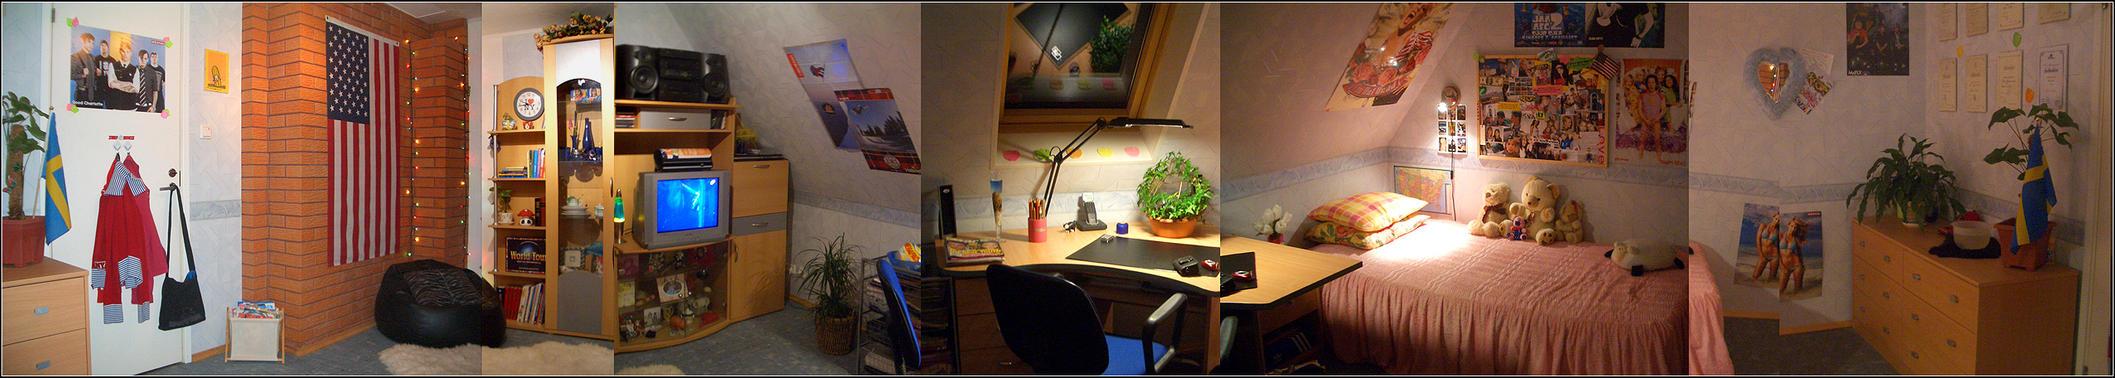 My room by p2ikezej2nku